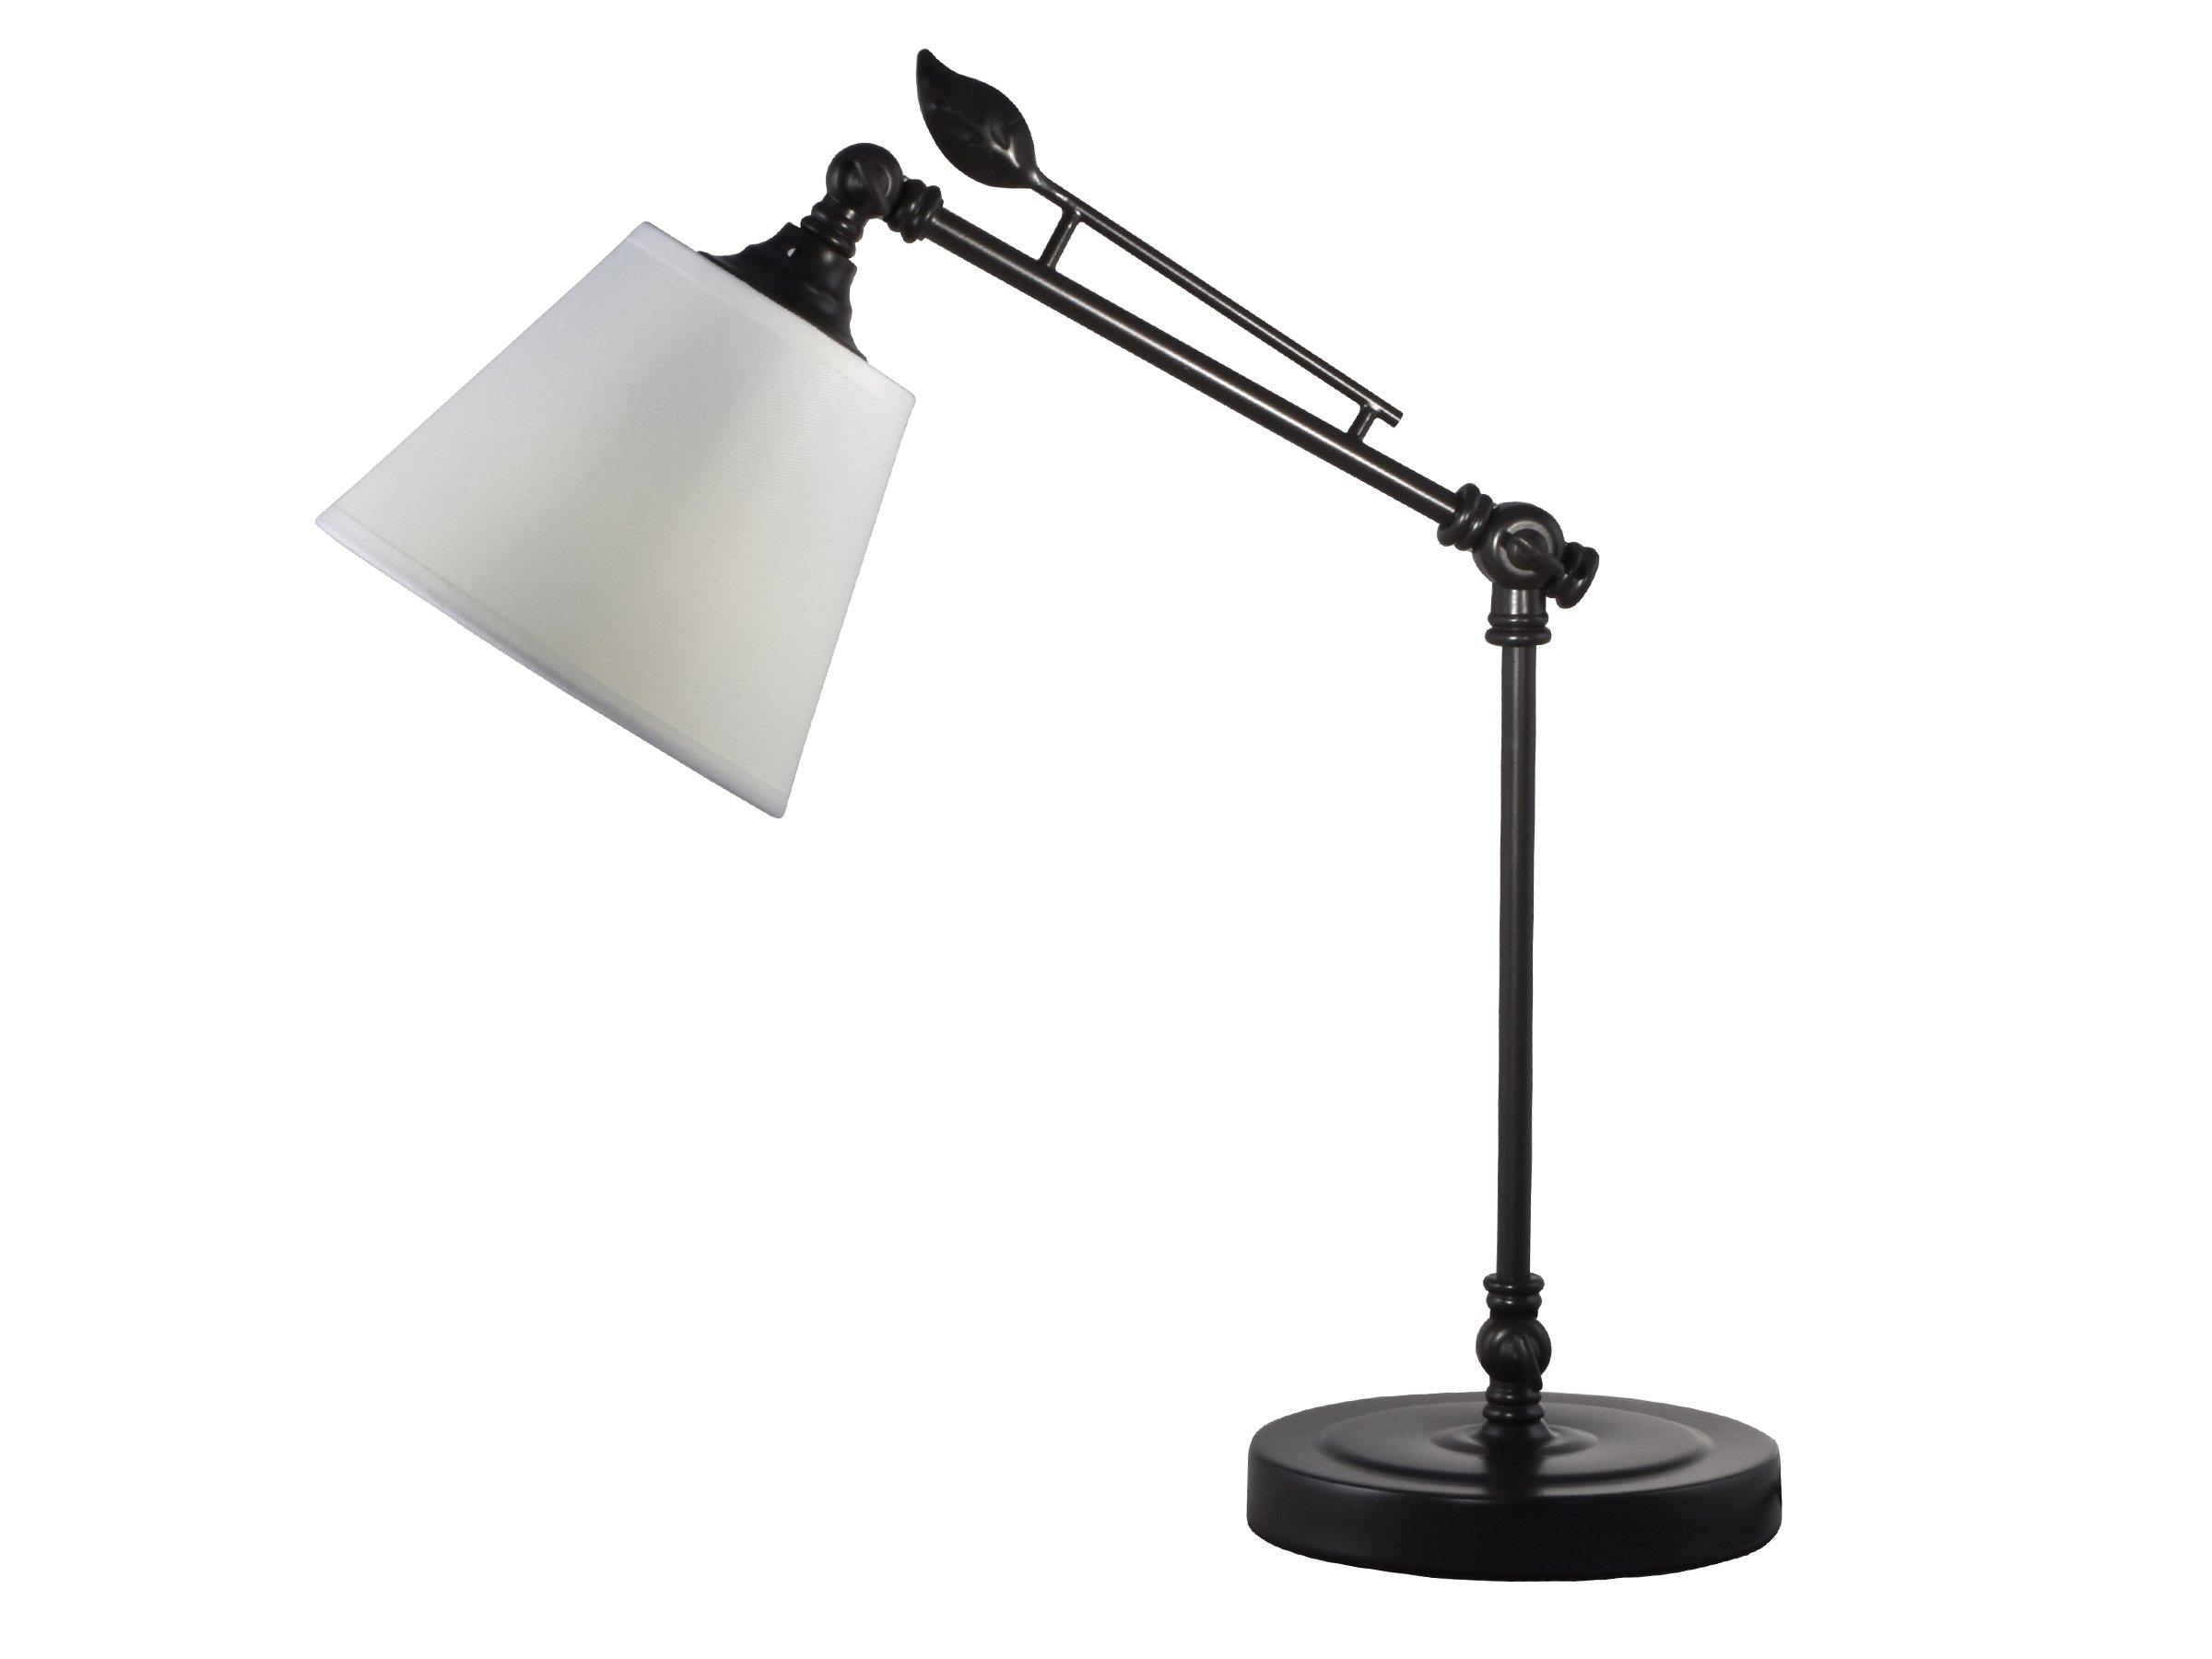 Springdale SPT16044 Urban Directional Desk Lamp, Dark Bronze